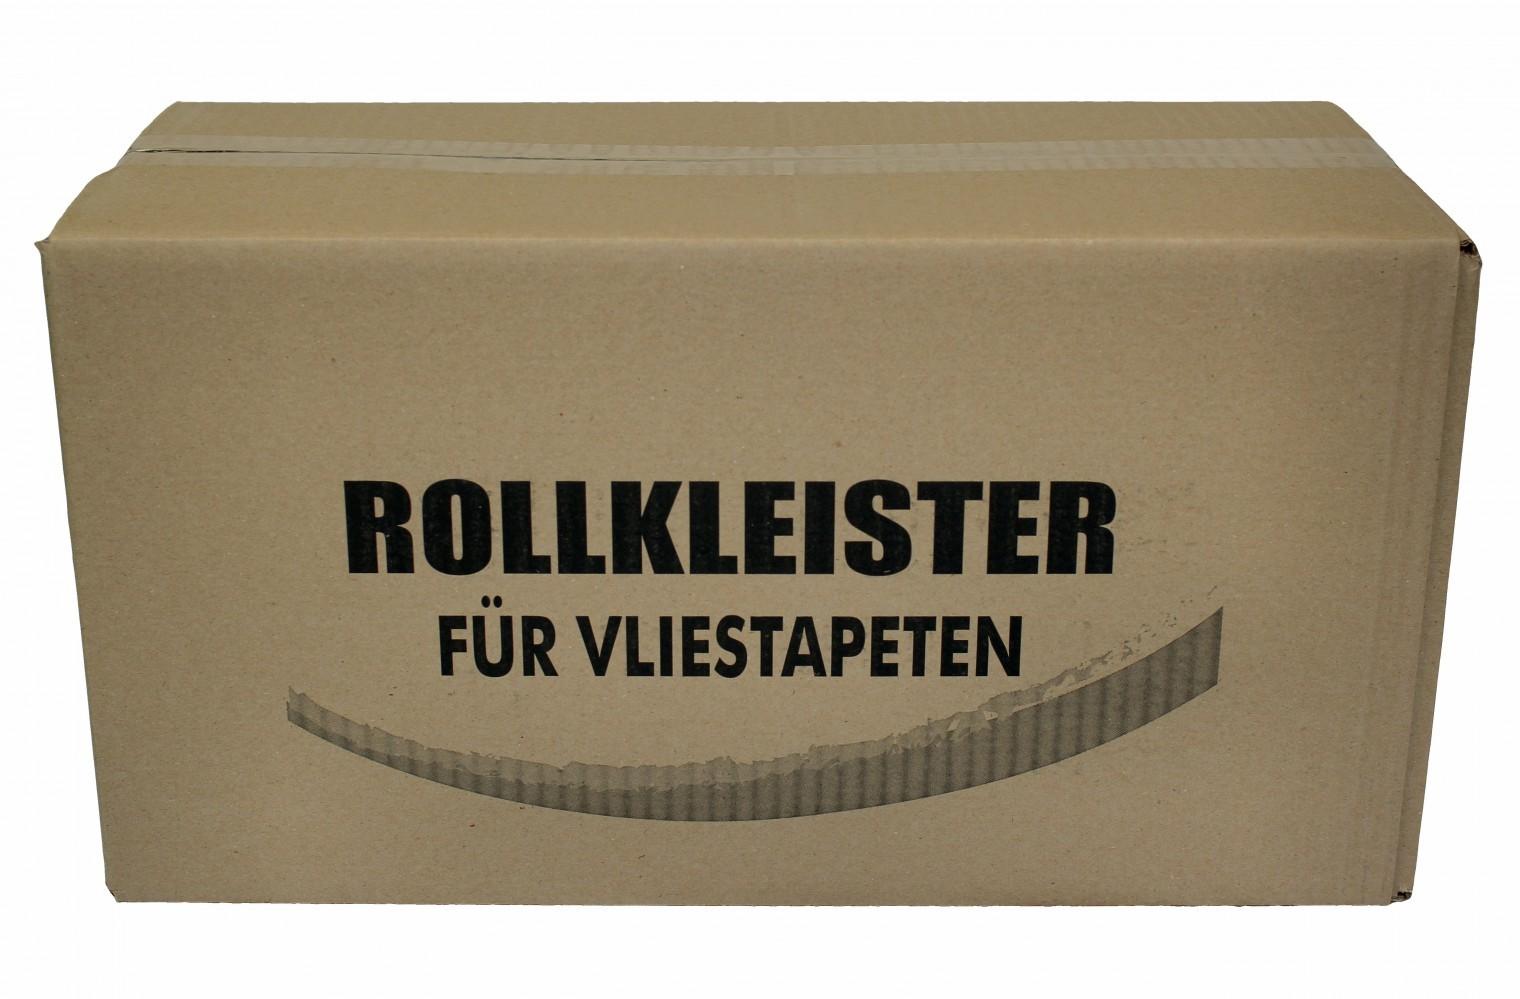 40 pakete vlieskleister rollkleister kleister f r. Black Bedroom Furniture Sets. Home Design Ideas